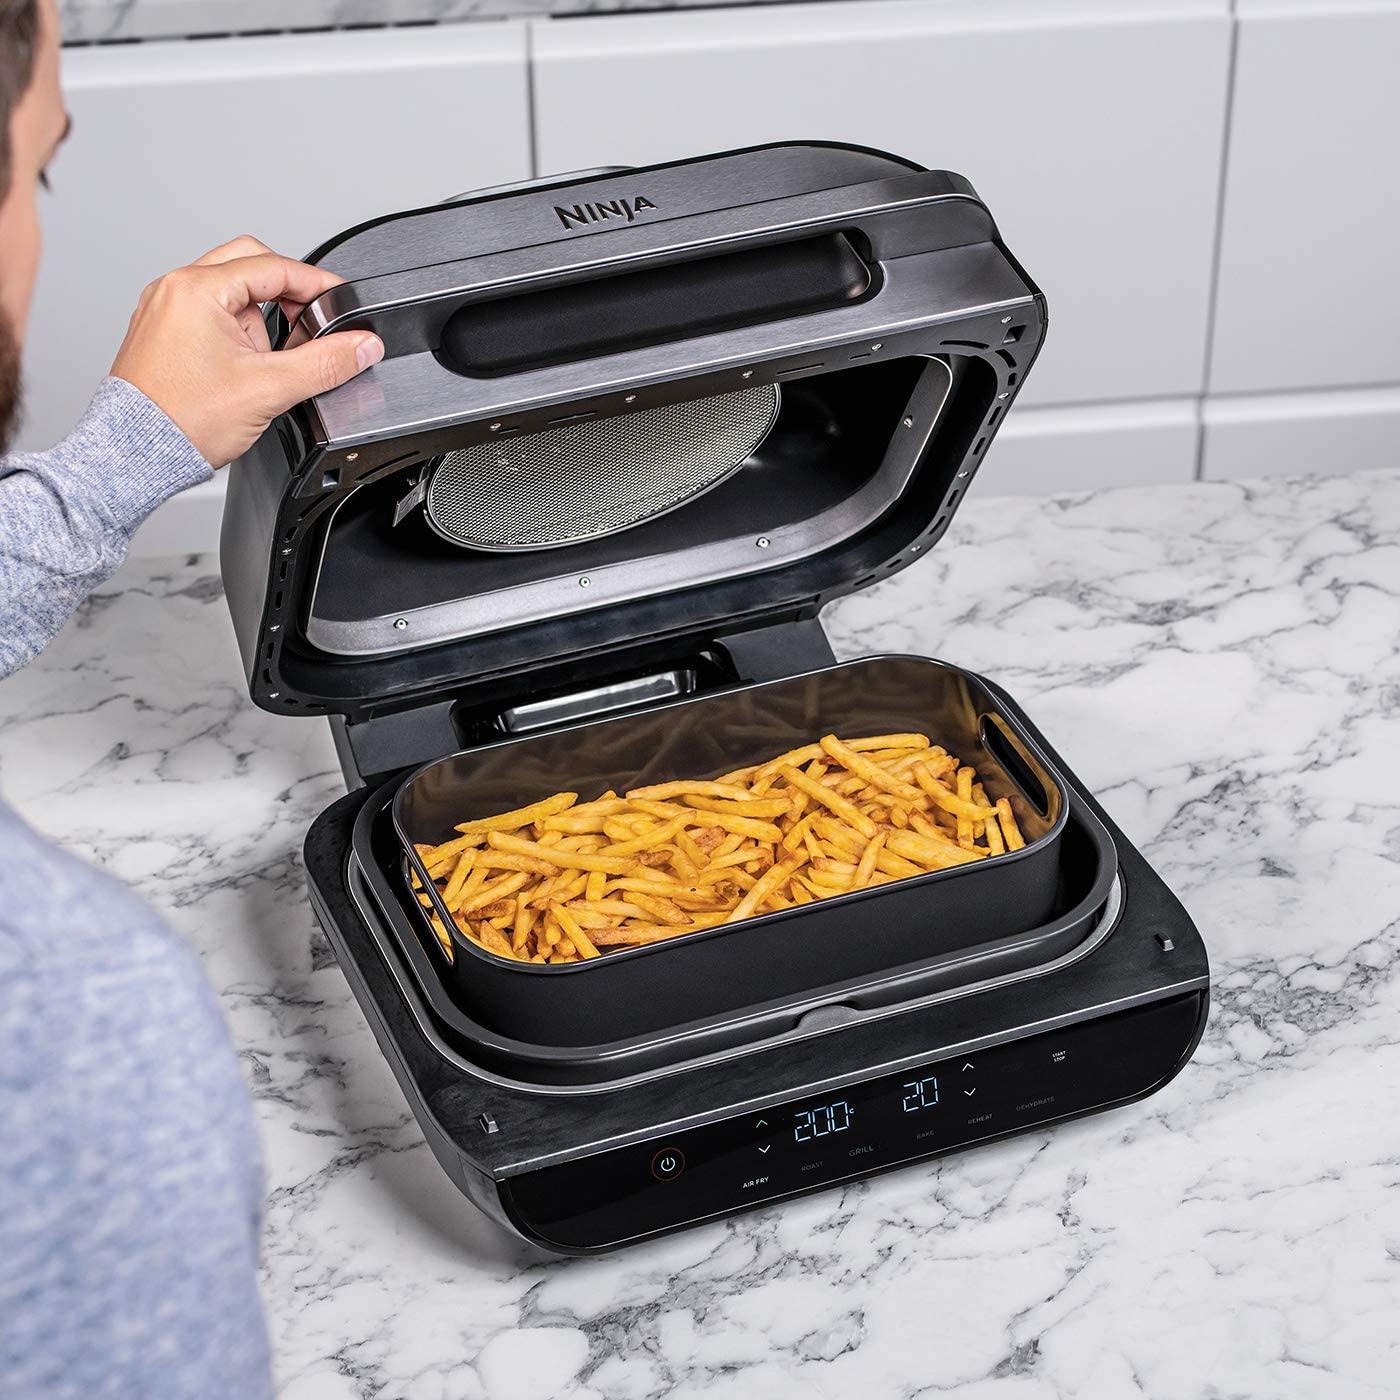 Ninja Foodi MAX Health Grill & Air Fryer Review